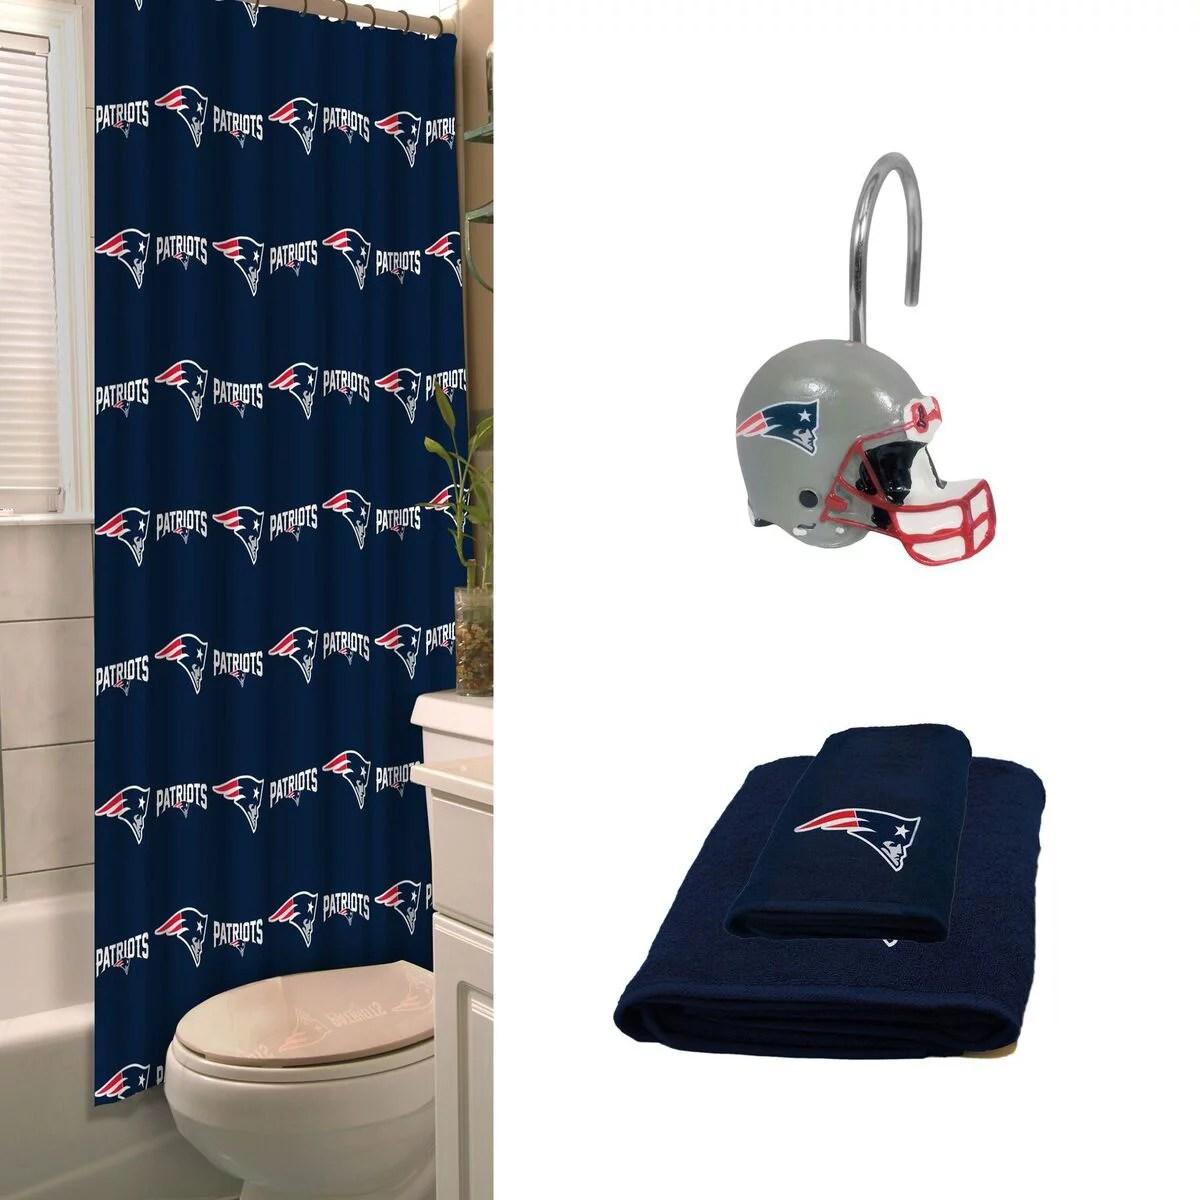 new england patriots bath set with hand bath towel shower curtain hooks